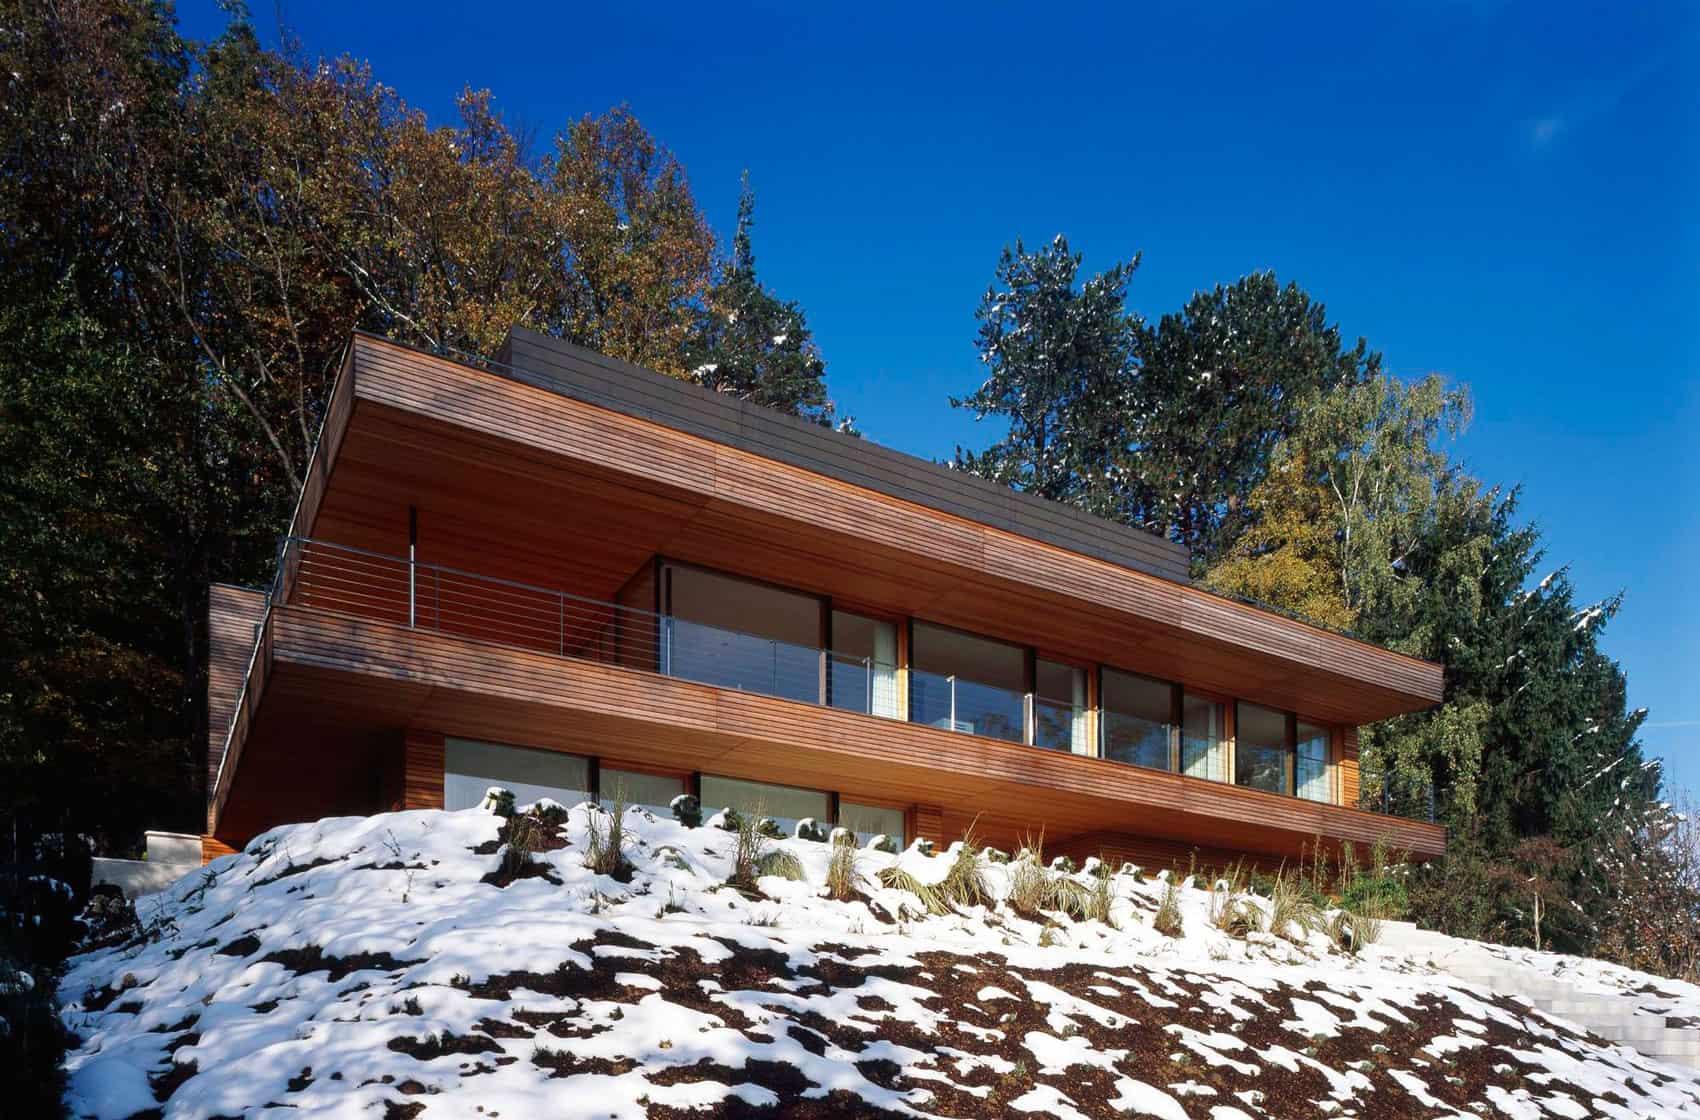 House Heilbronn by k m architektur (5)